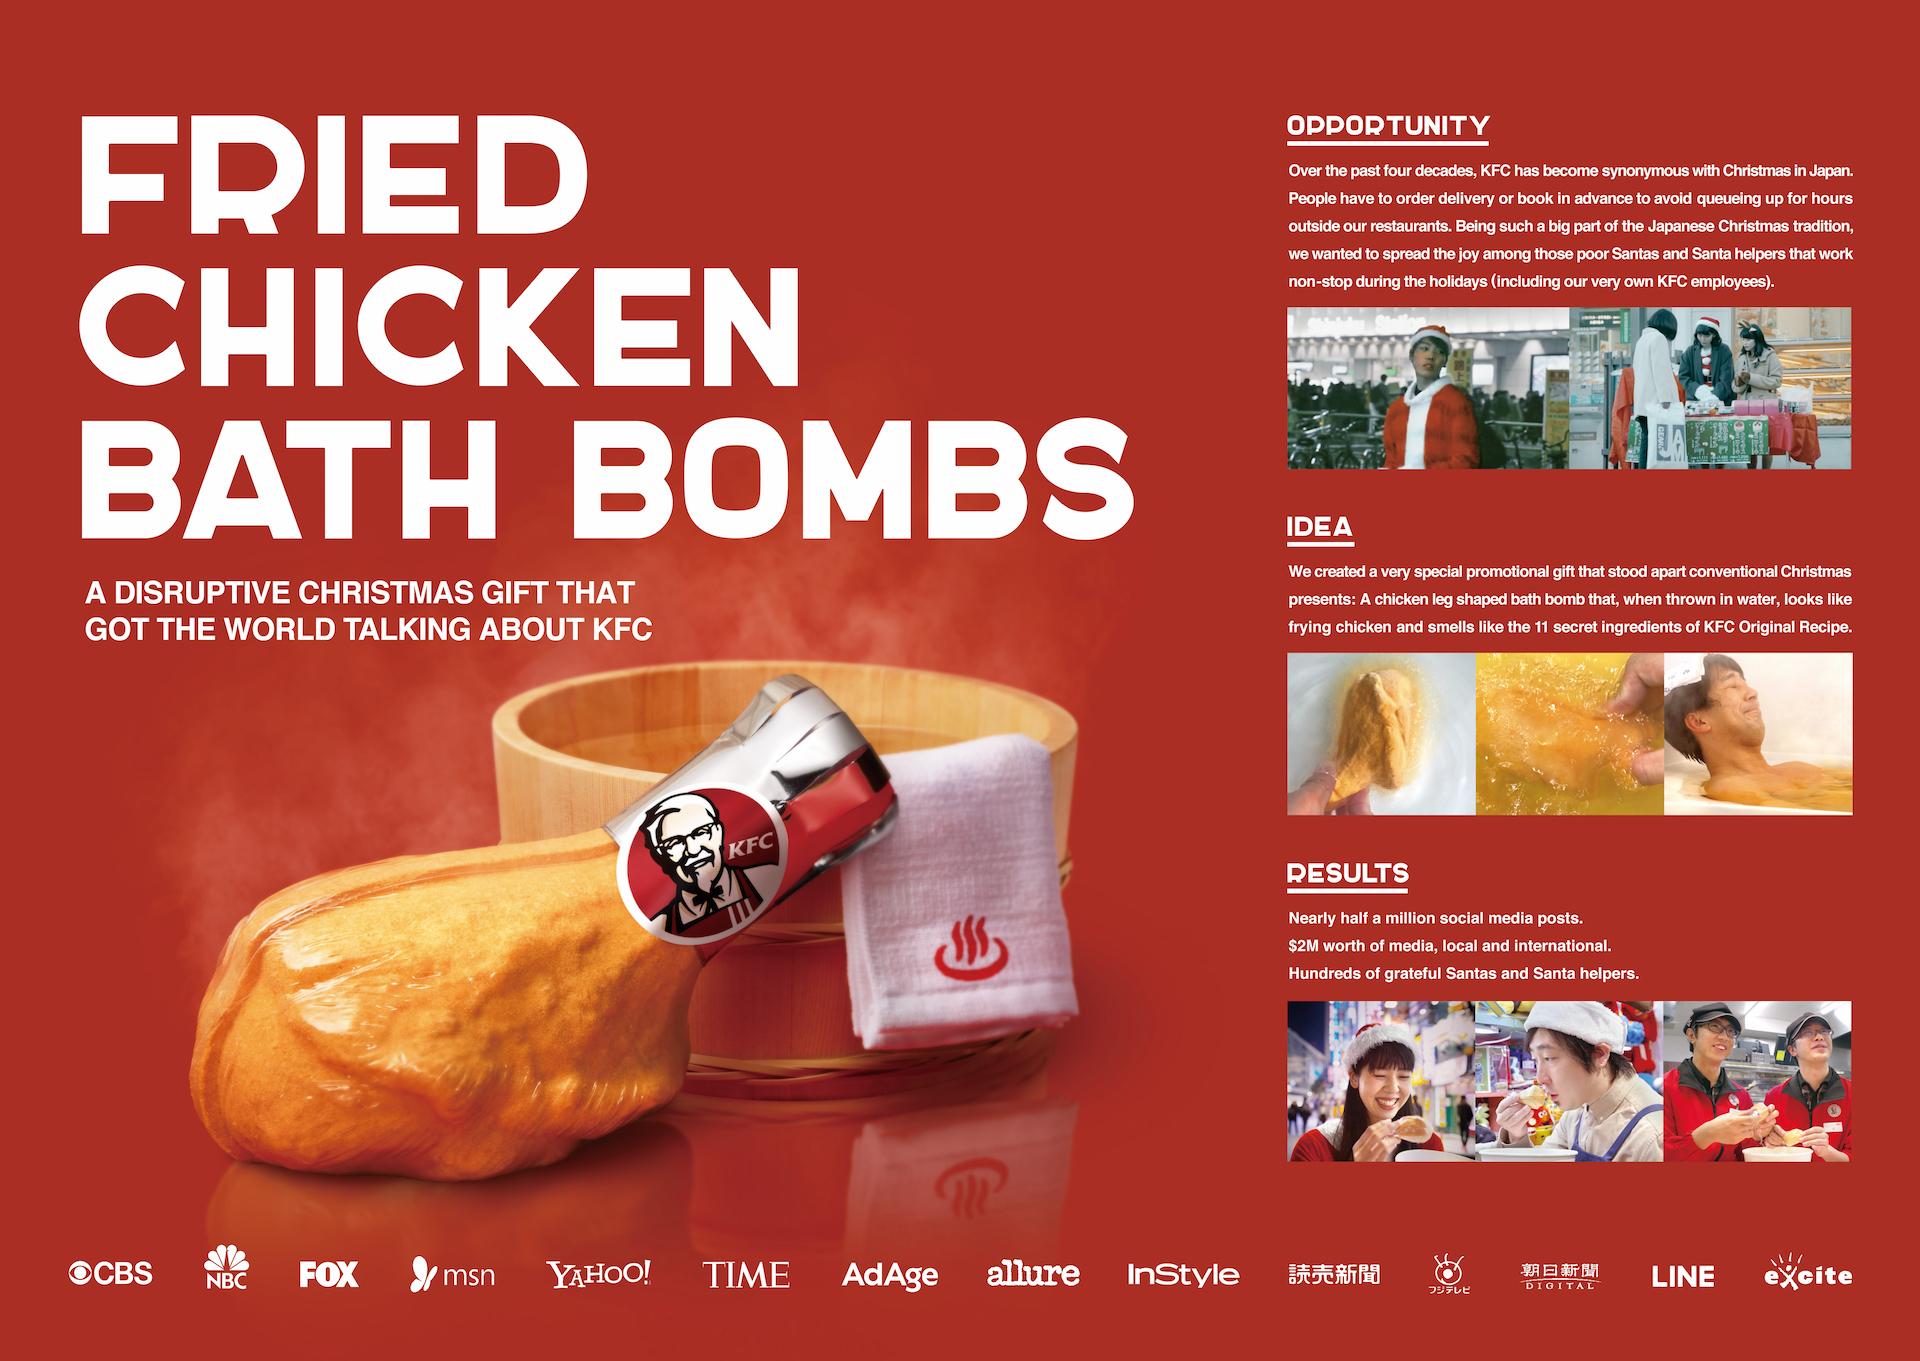 Fried-Chicken-Bath-Bomb.jpg